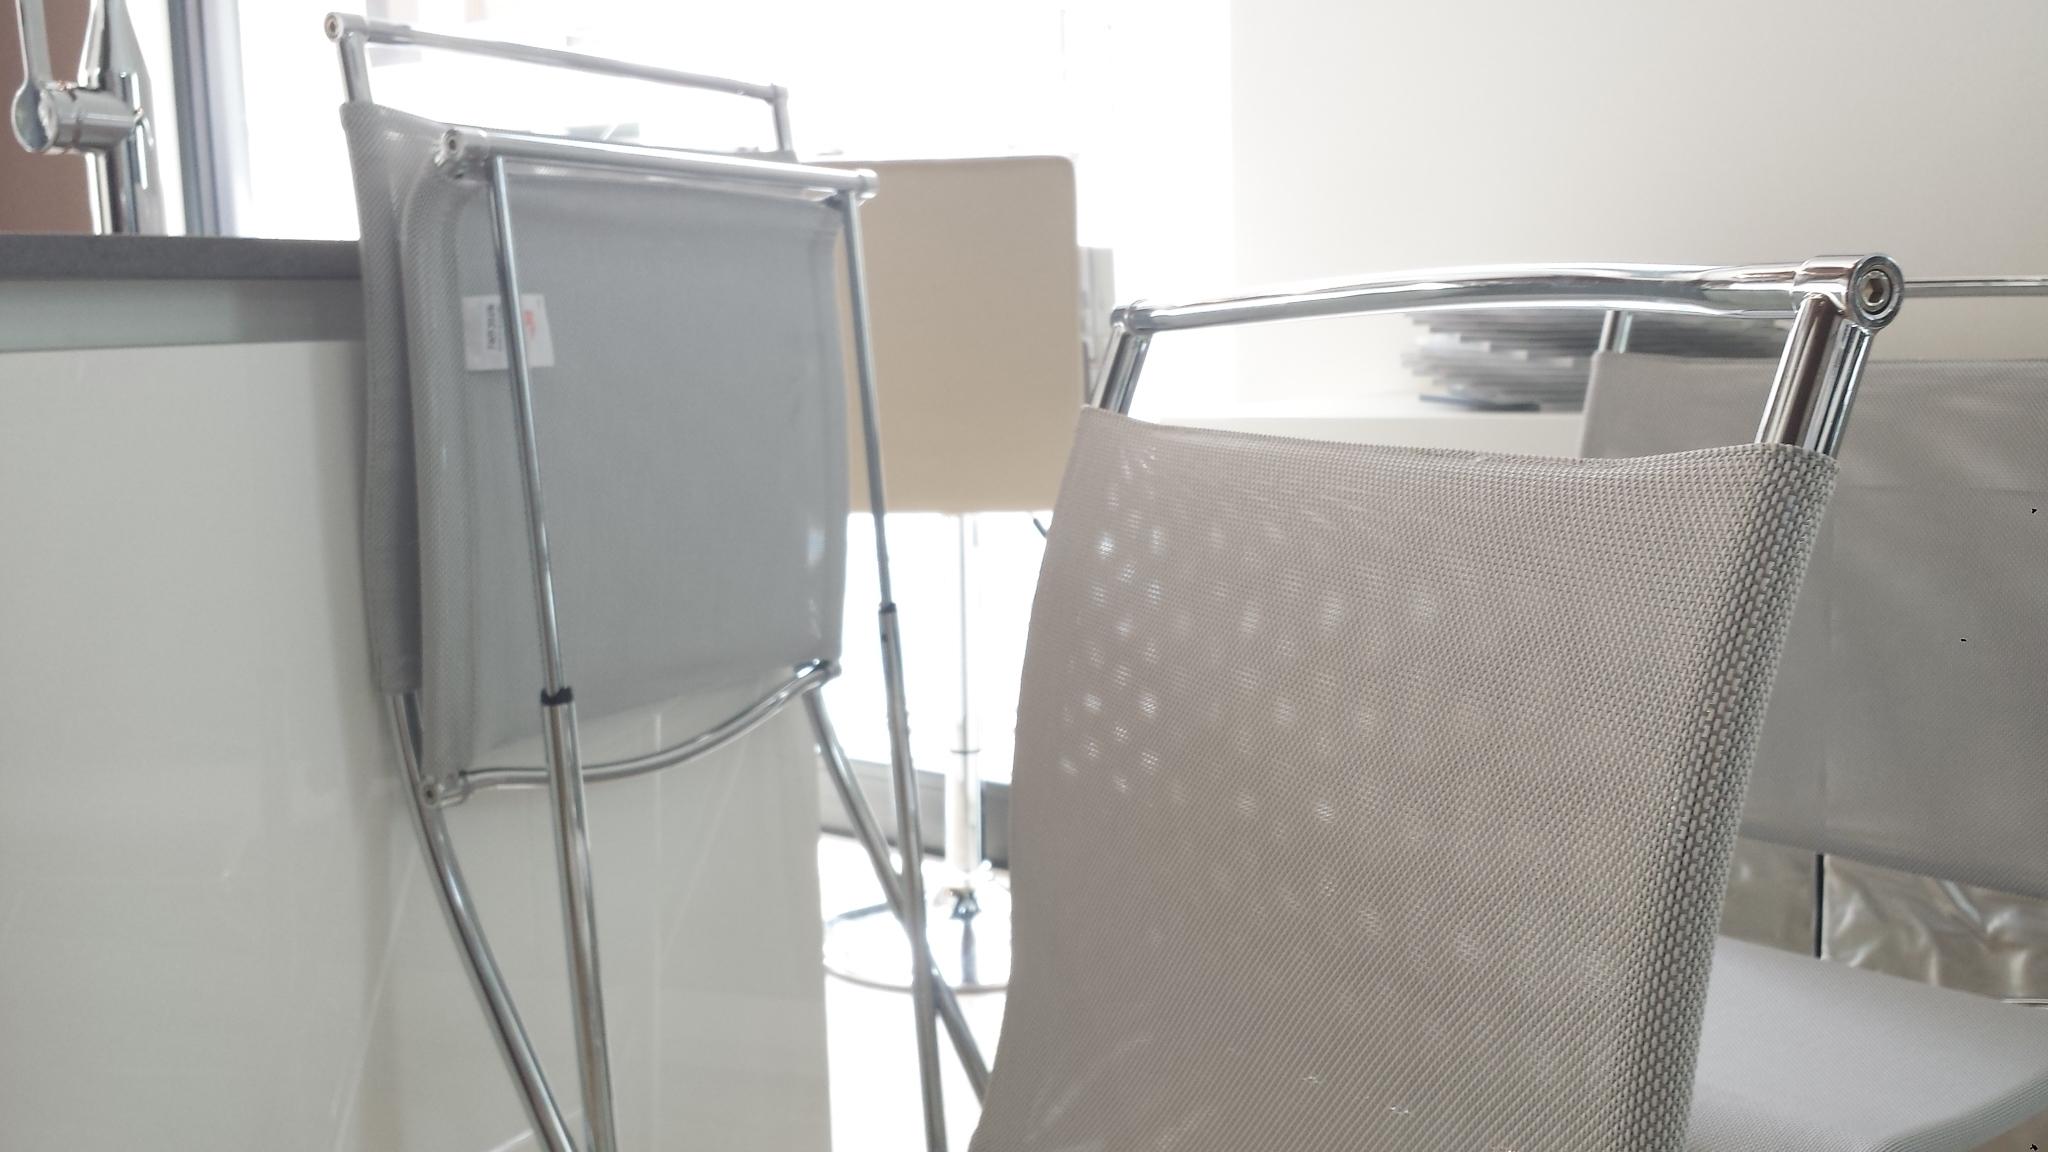 sedia calligaris mod. air folding 19664 - sedie a prezzi scontati - Sedie Cucina Scontate Calligaris